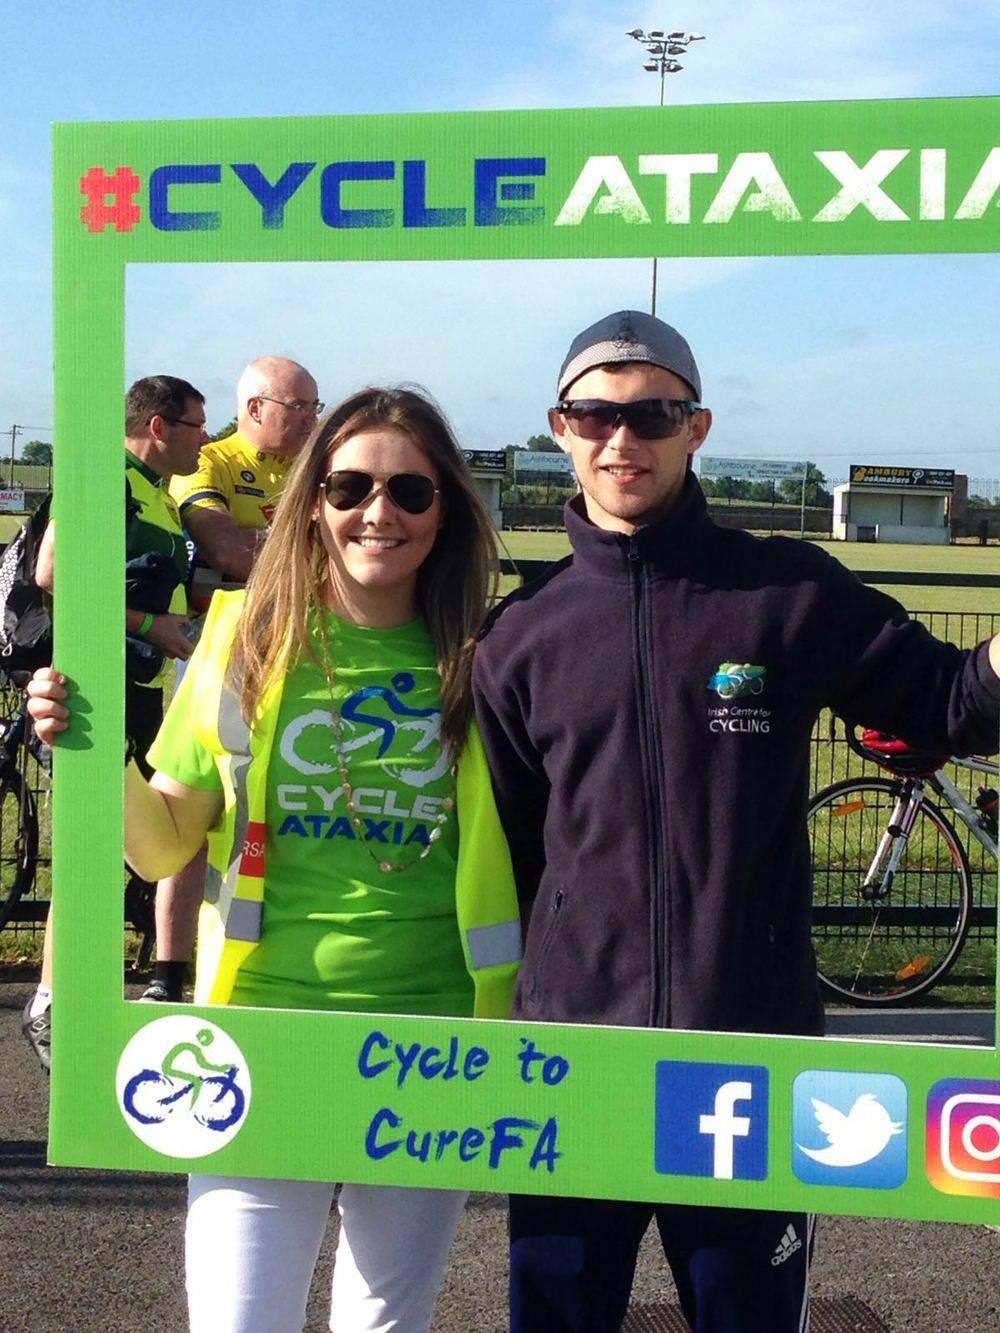 Cycle Ataxia Venue (19).JPG